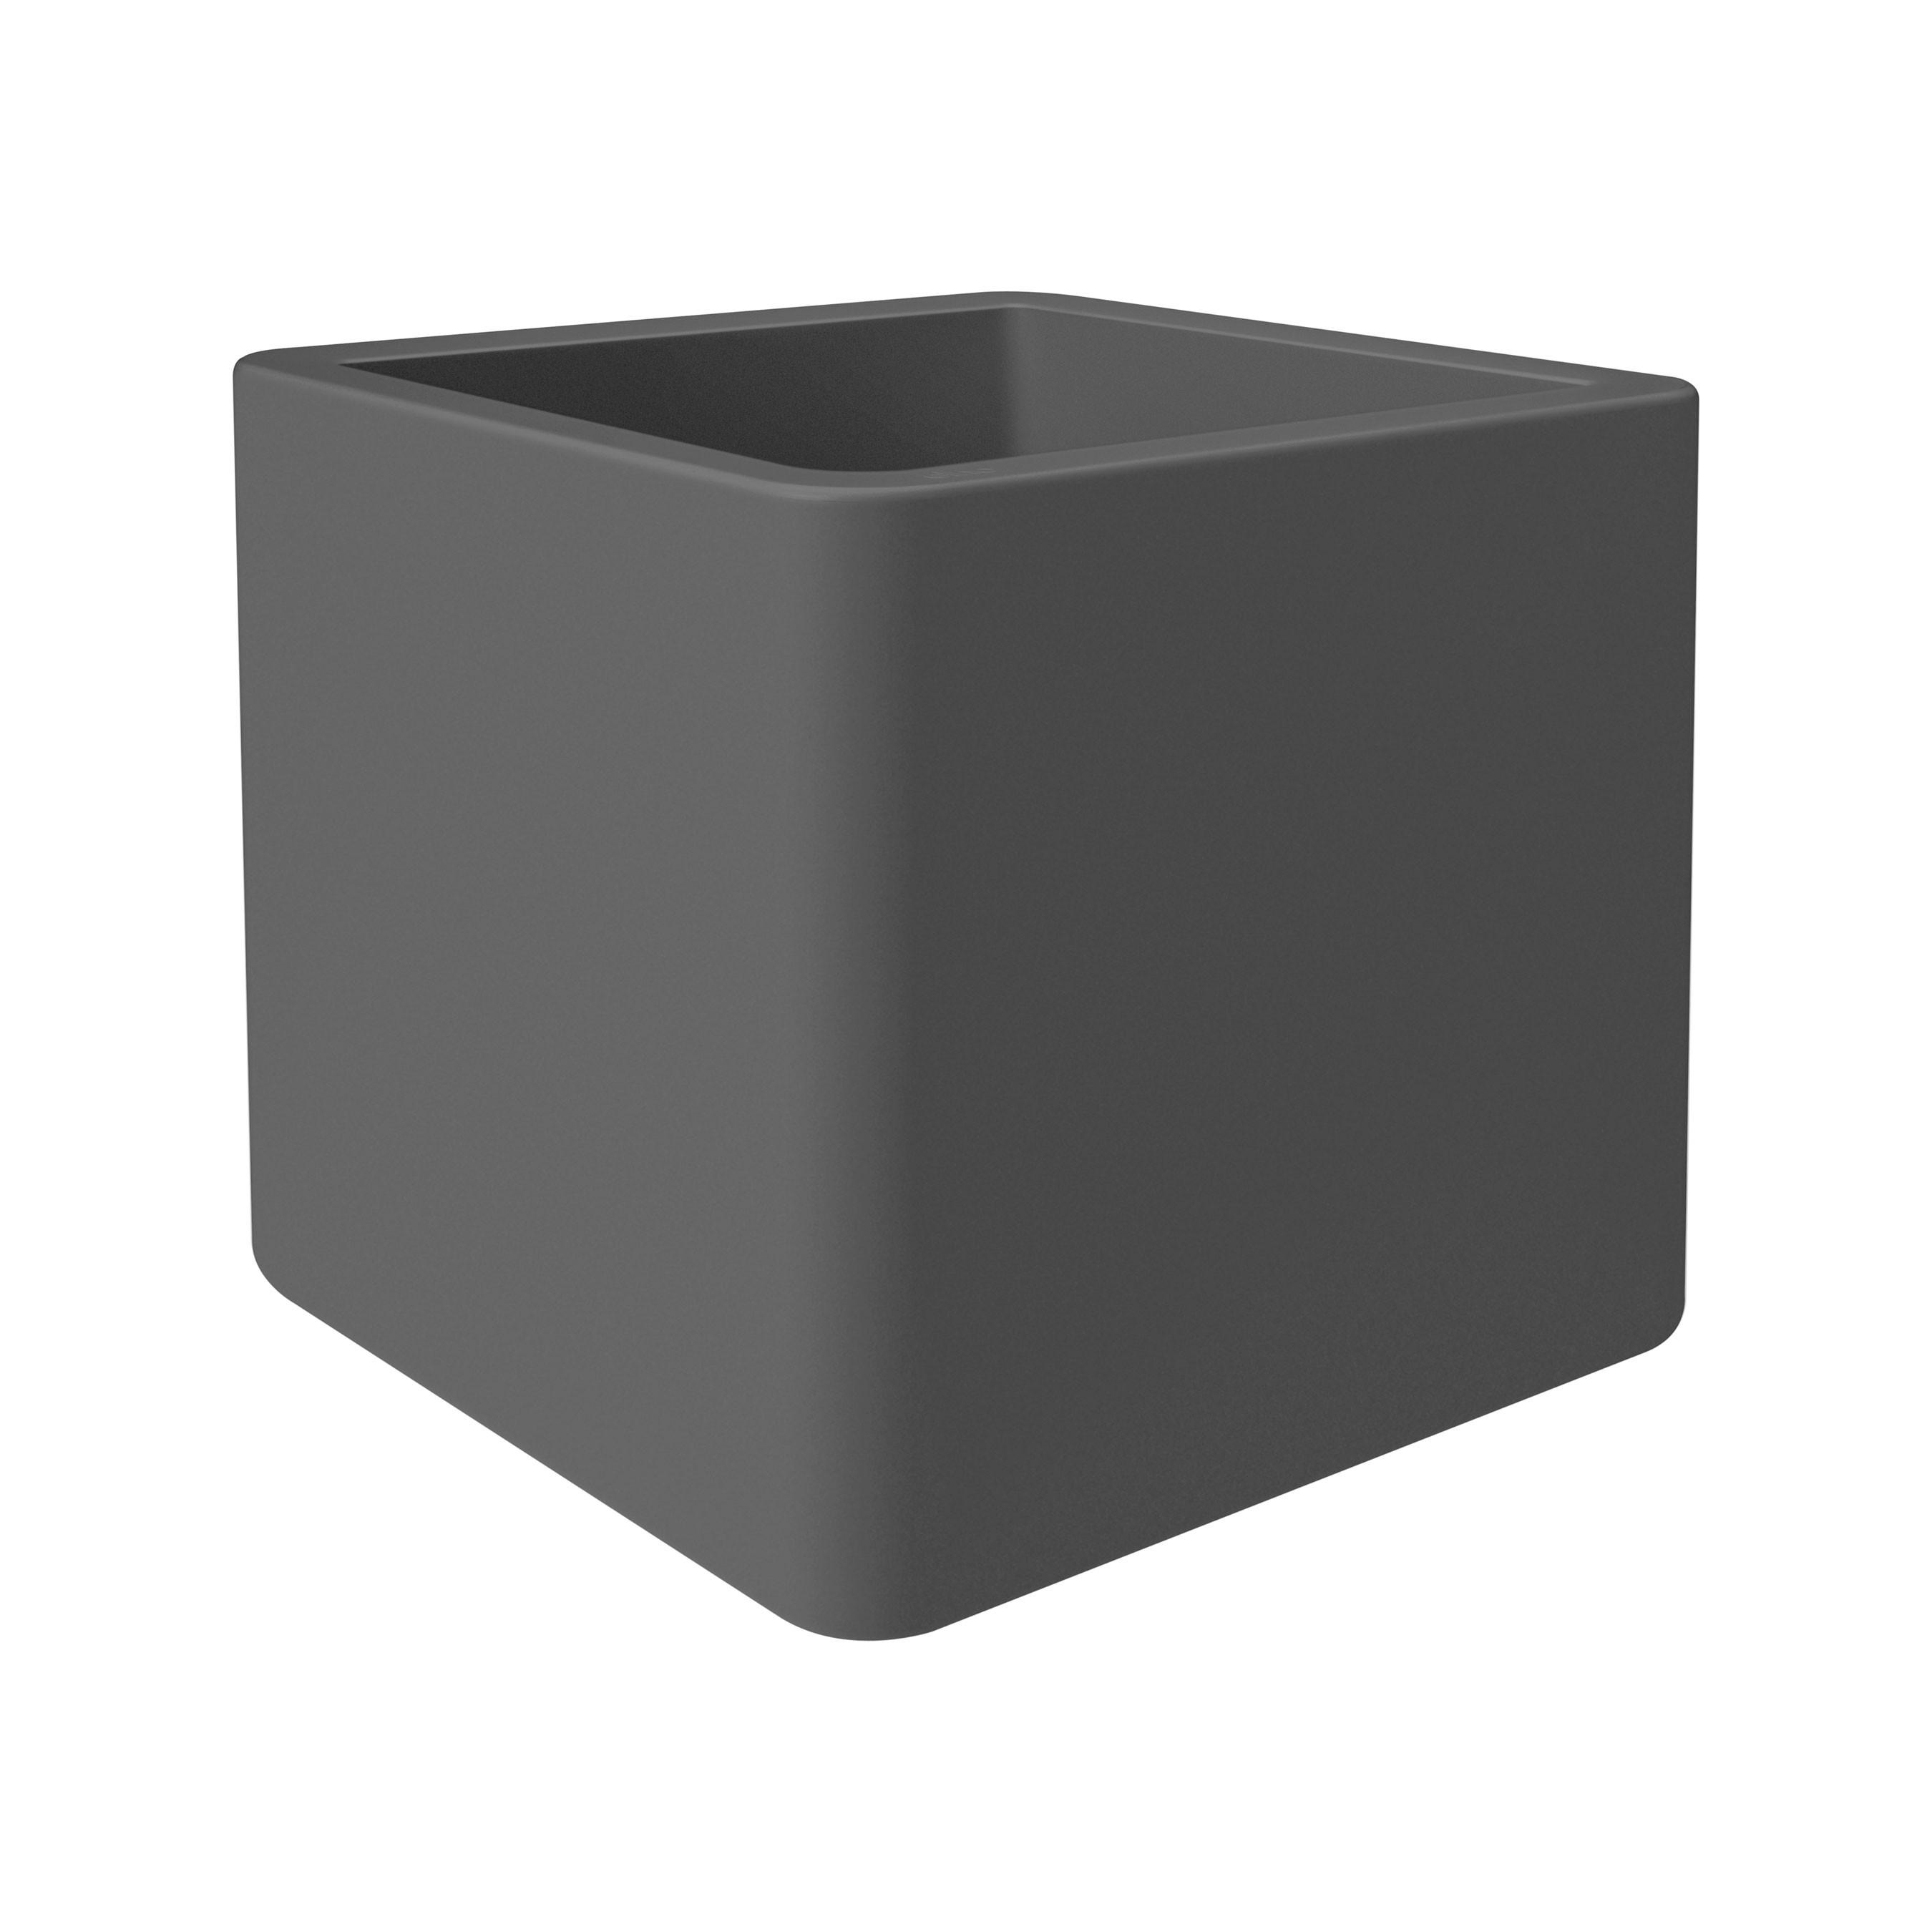 Pflanzgefäß / Pflanzkasten elho Pure Soft Brick 40x40x39cm anthrazit Bild 1